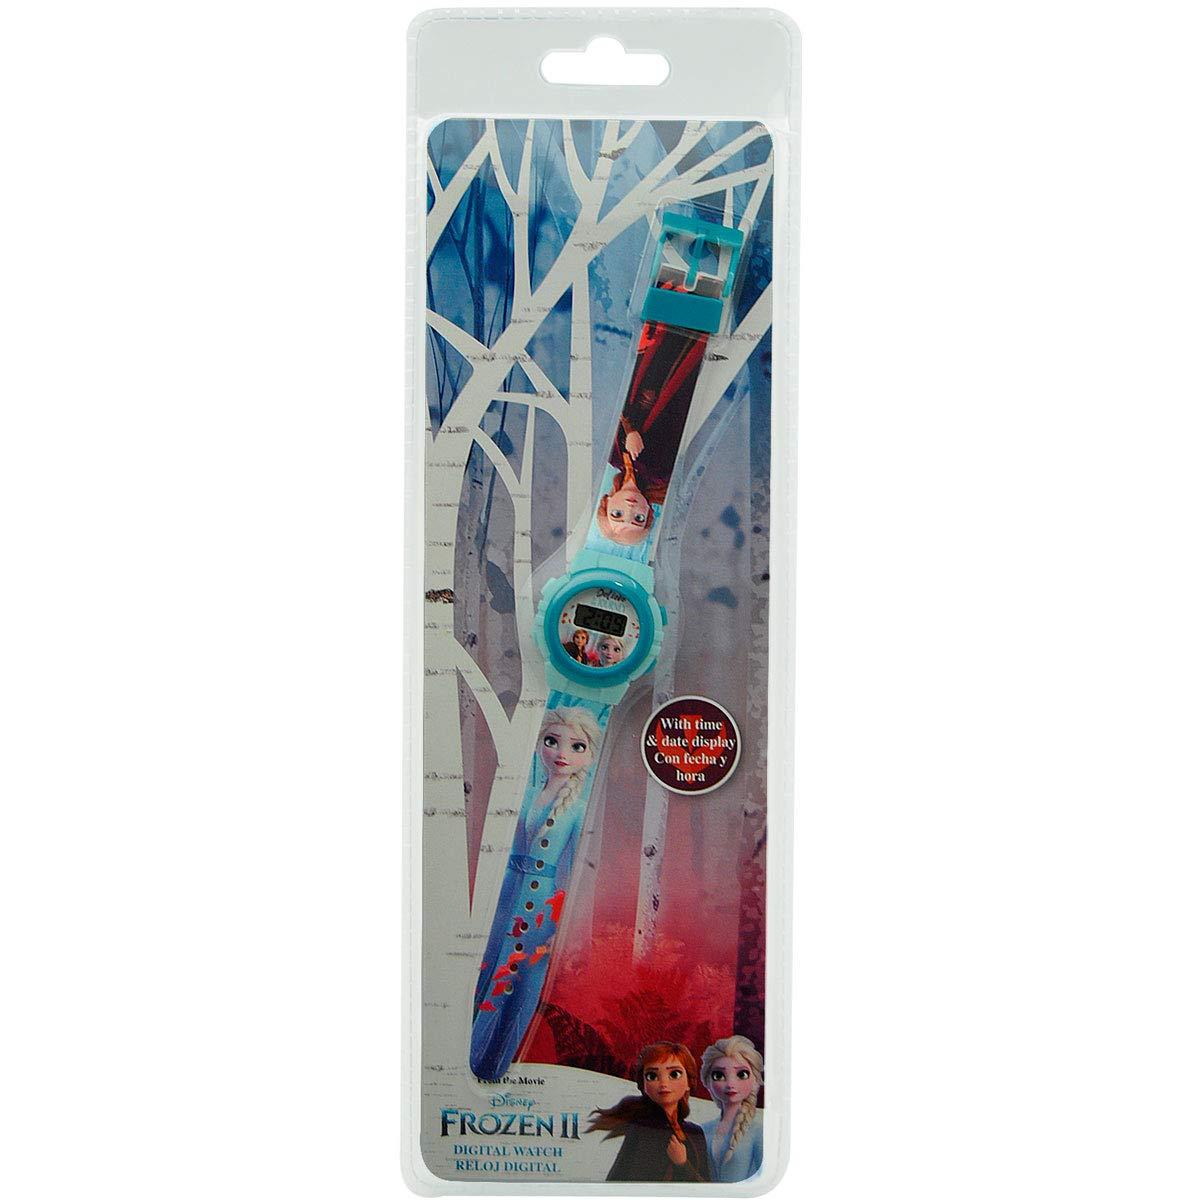 Disney 冰雪奇缘 WD20747 Frozen 2 数字女孩手表